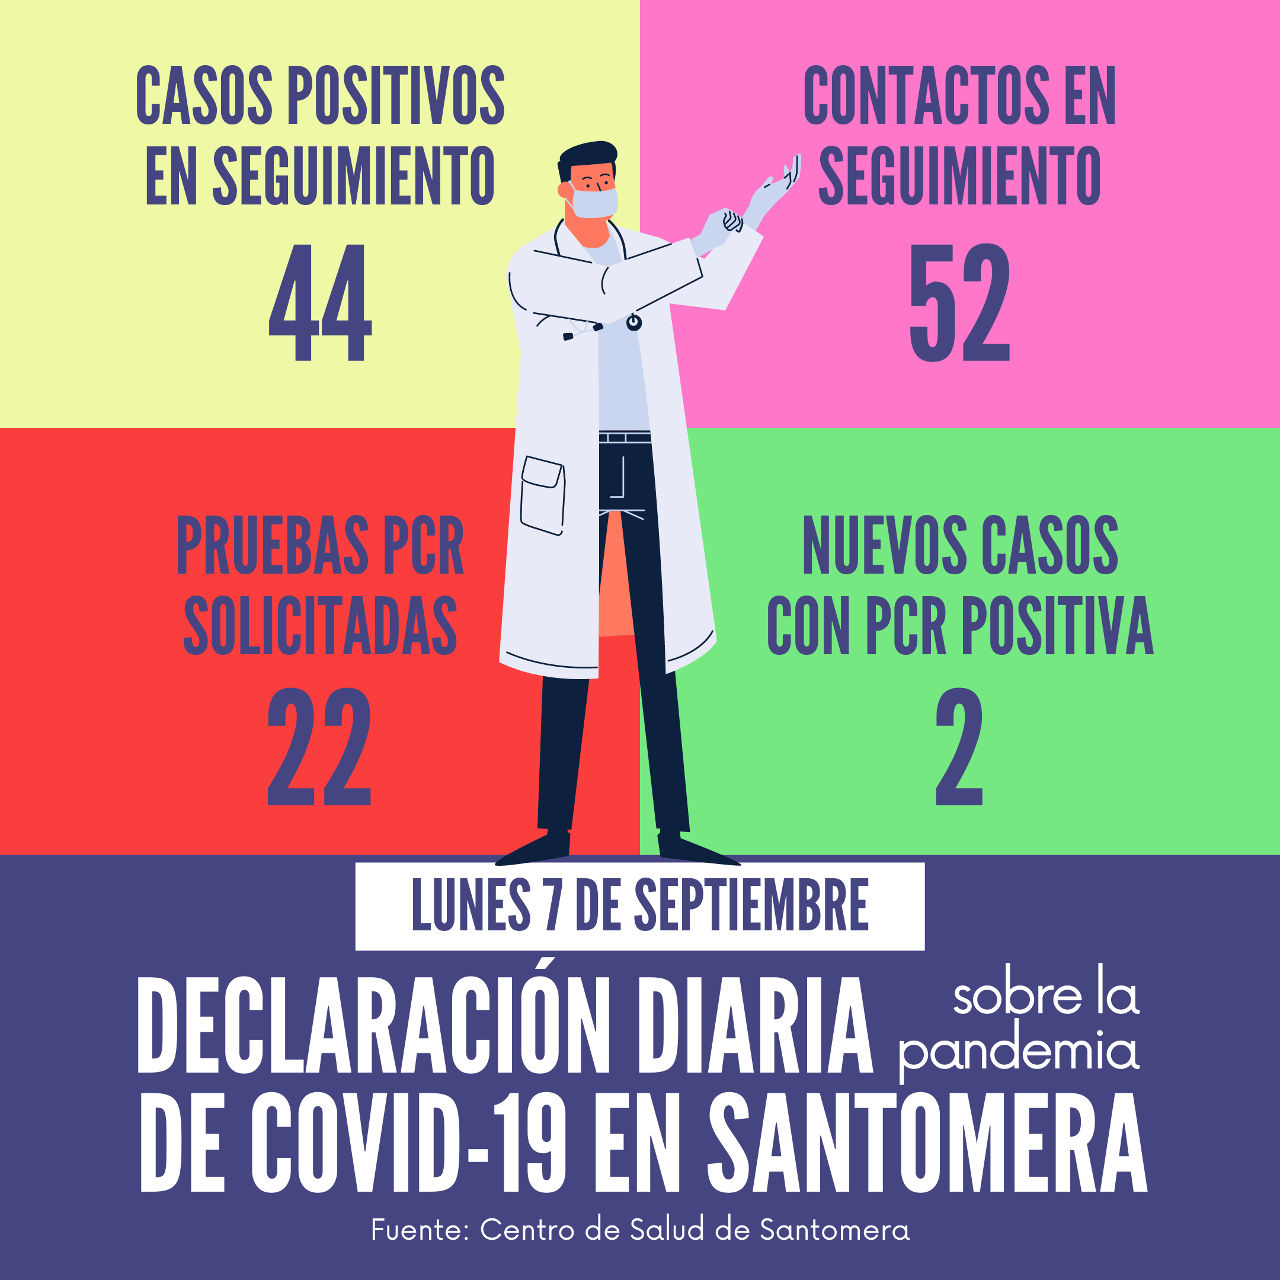 20200907_Datos COVID-19 Santomera